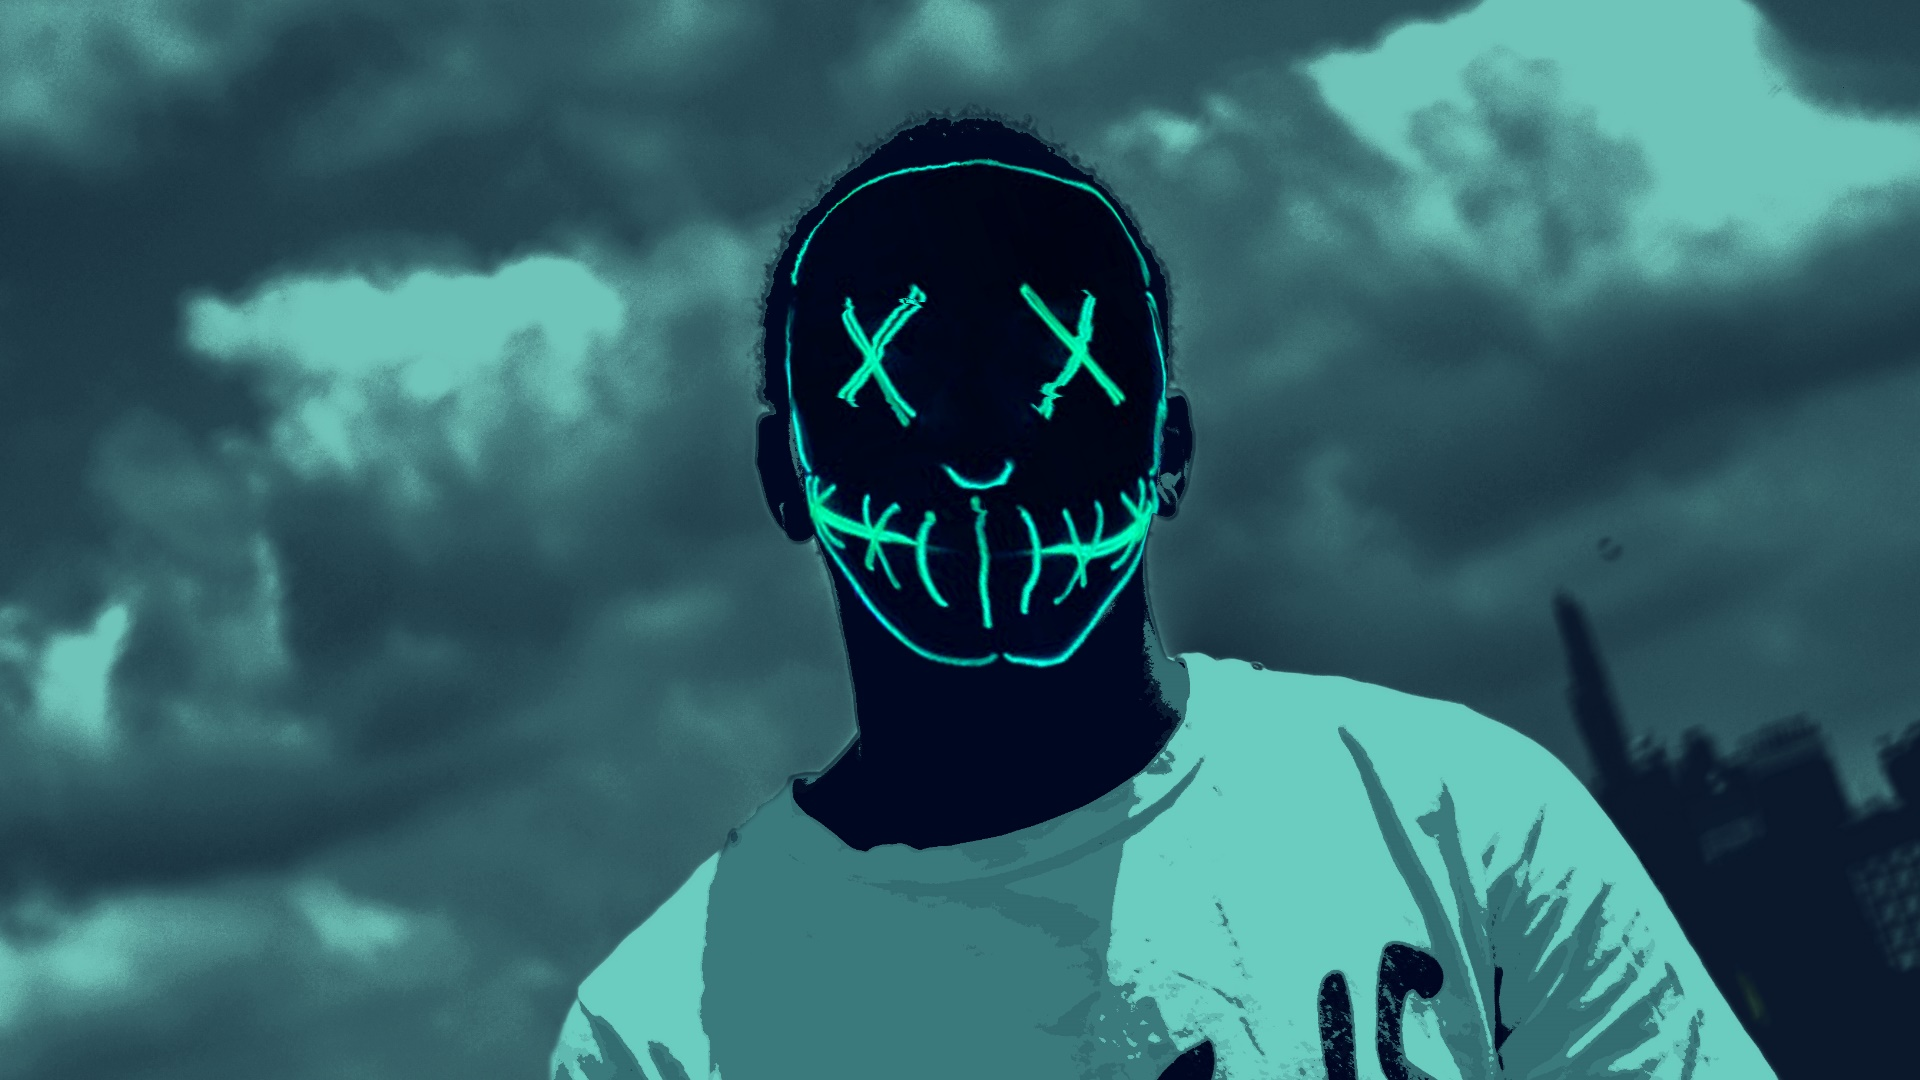 Cyan Neon Mask wallpaper